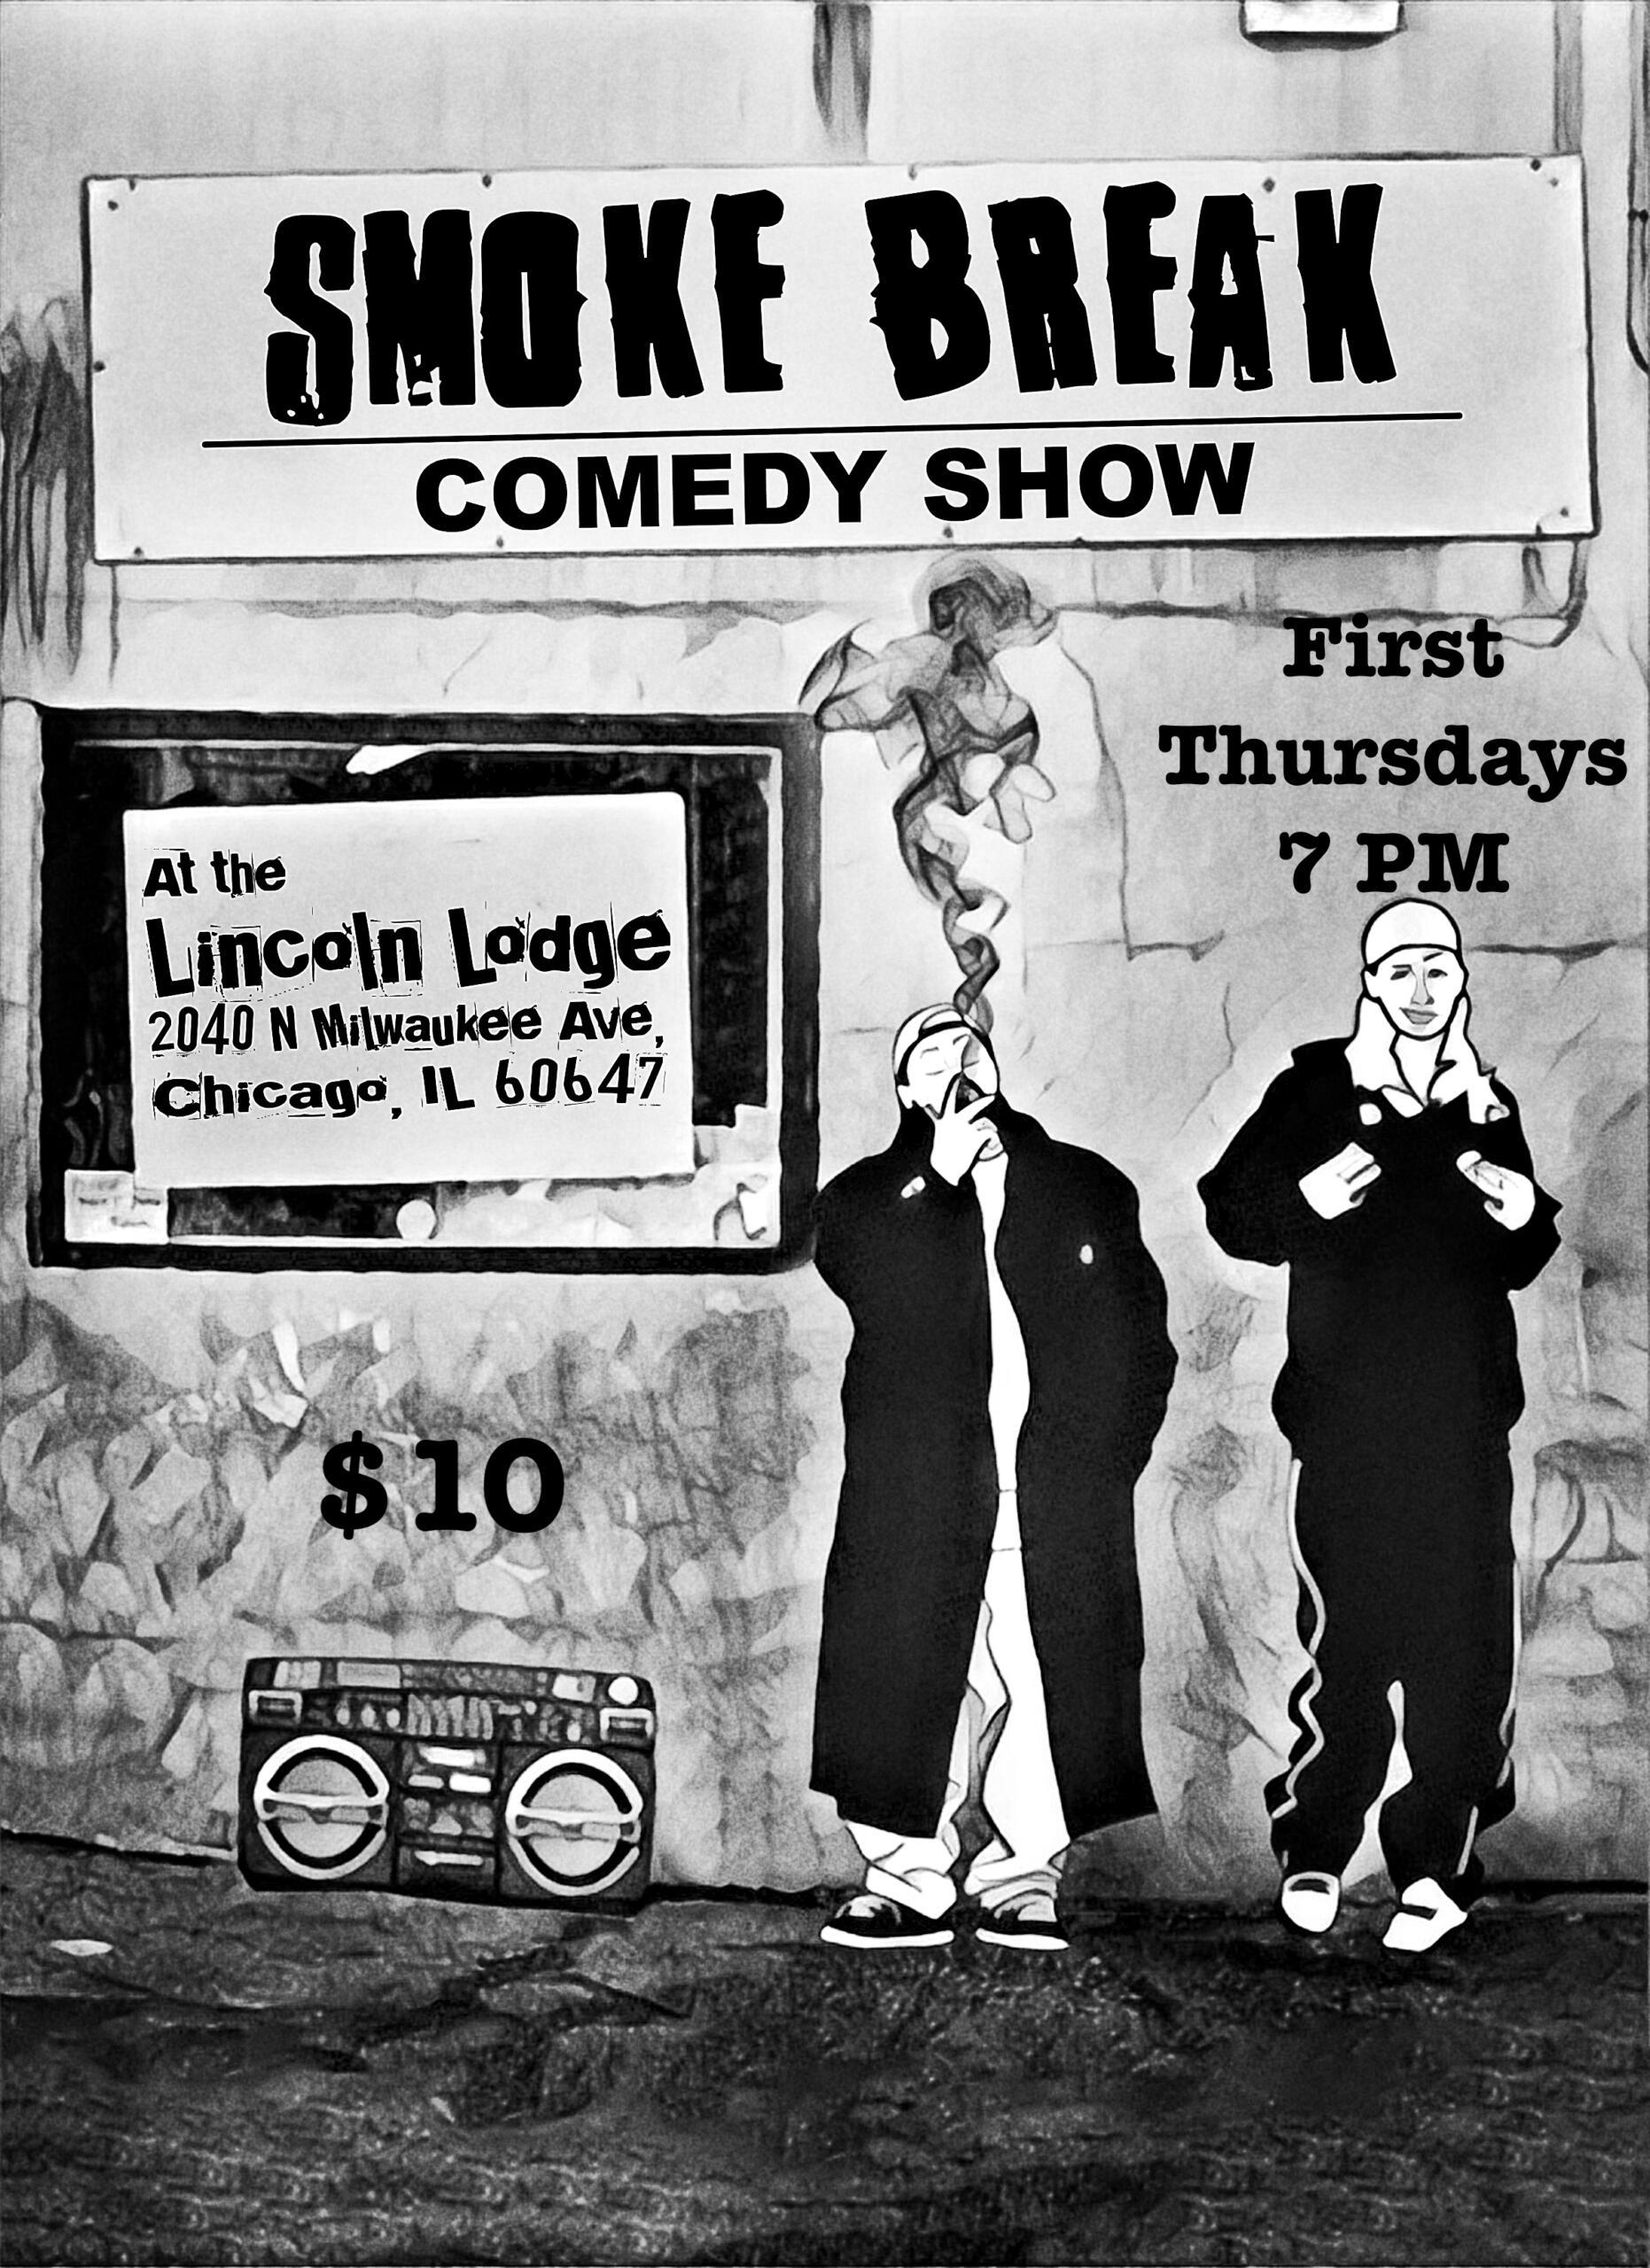 Smoke Break Comedy Show